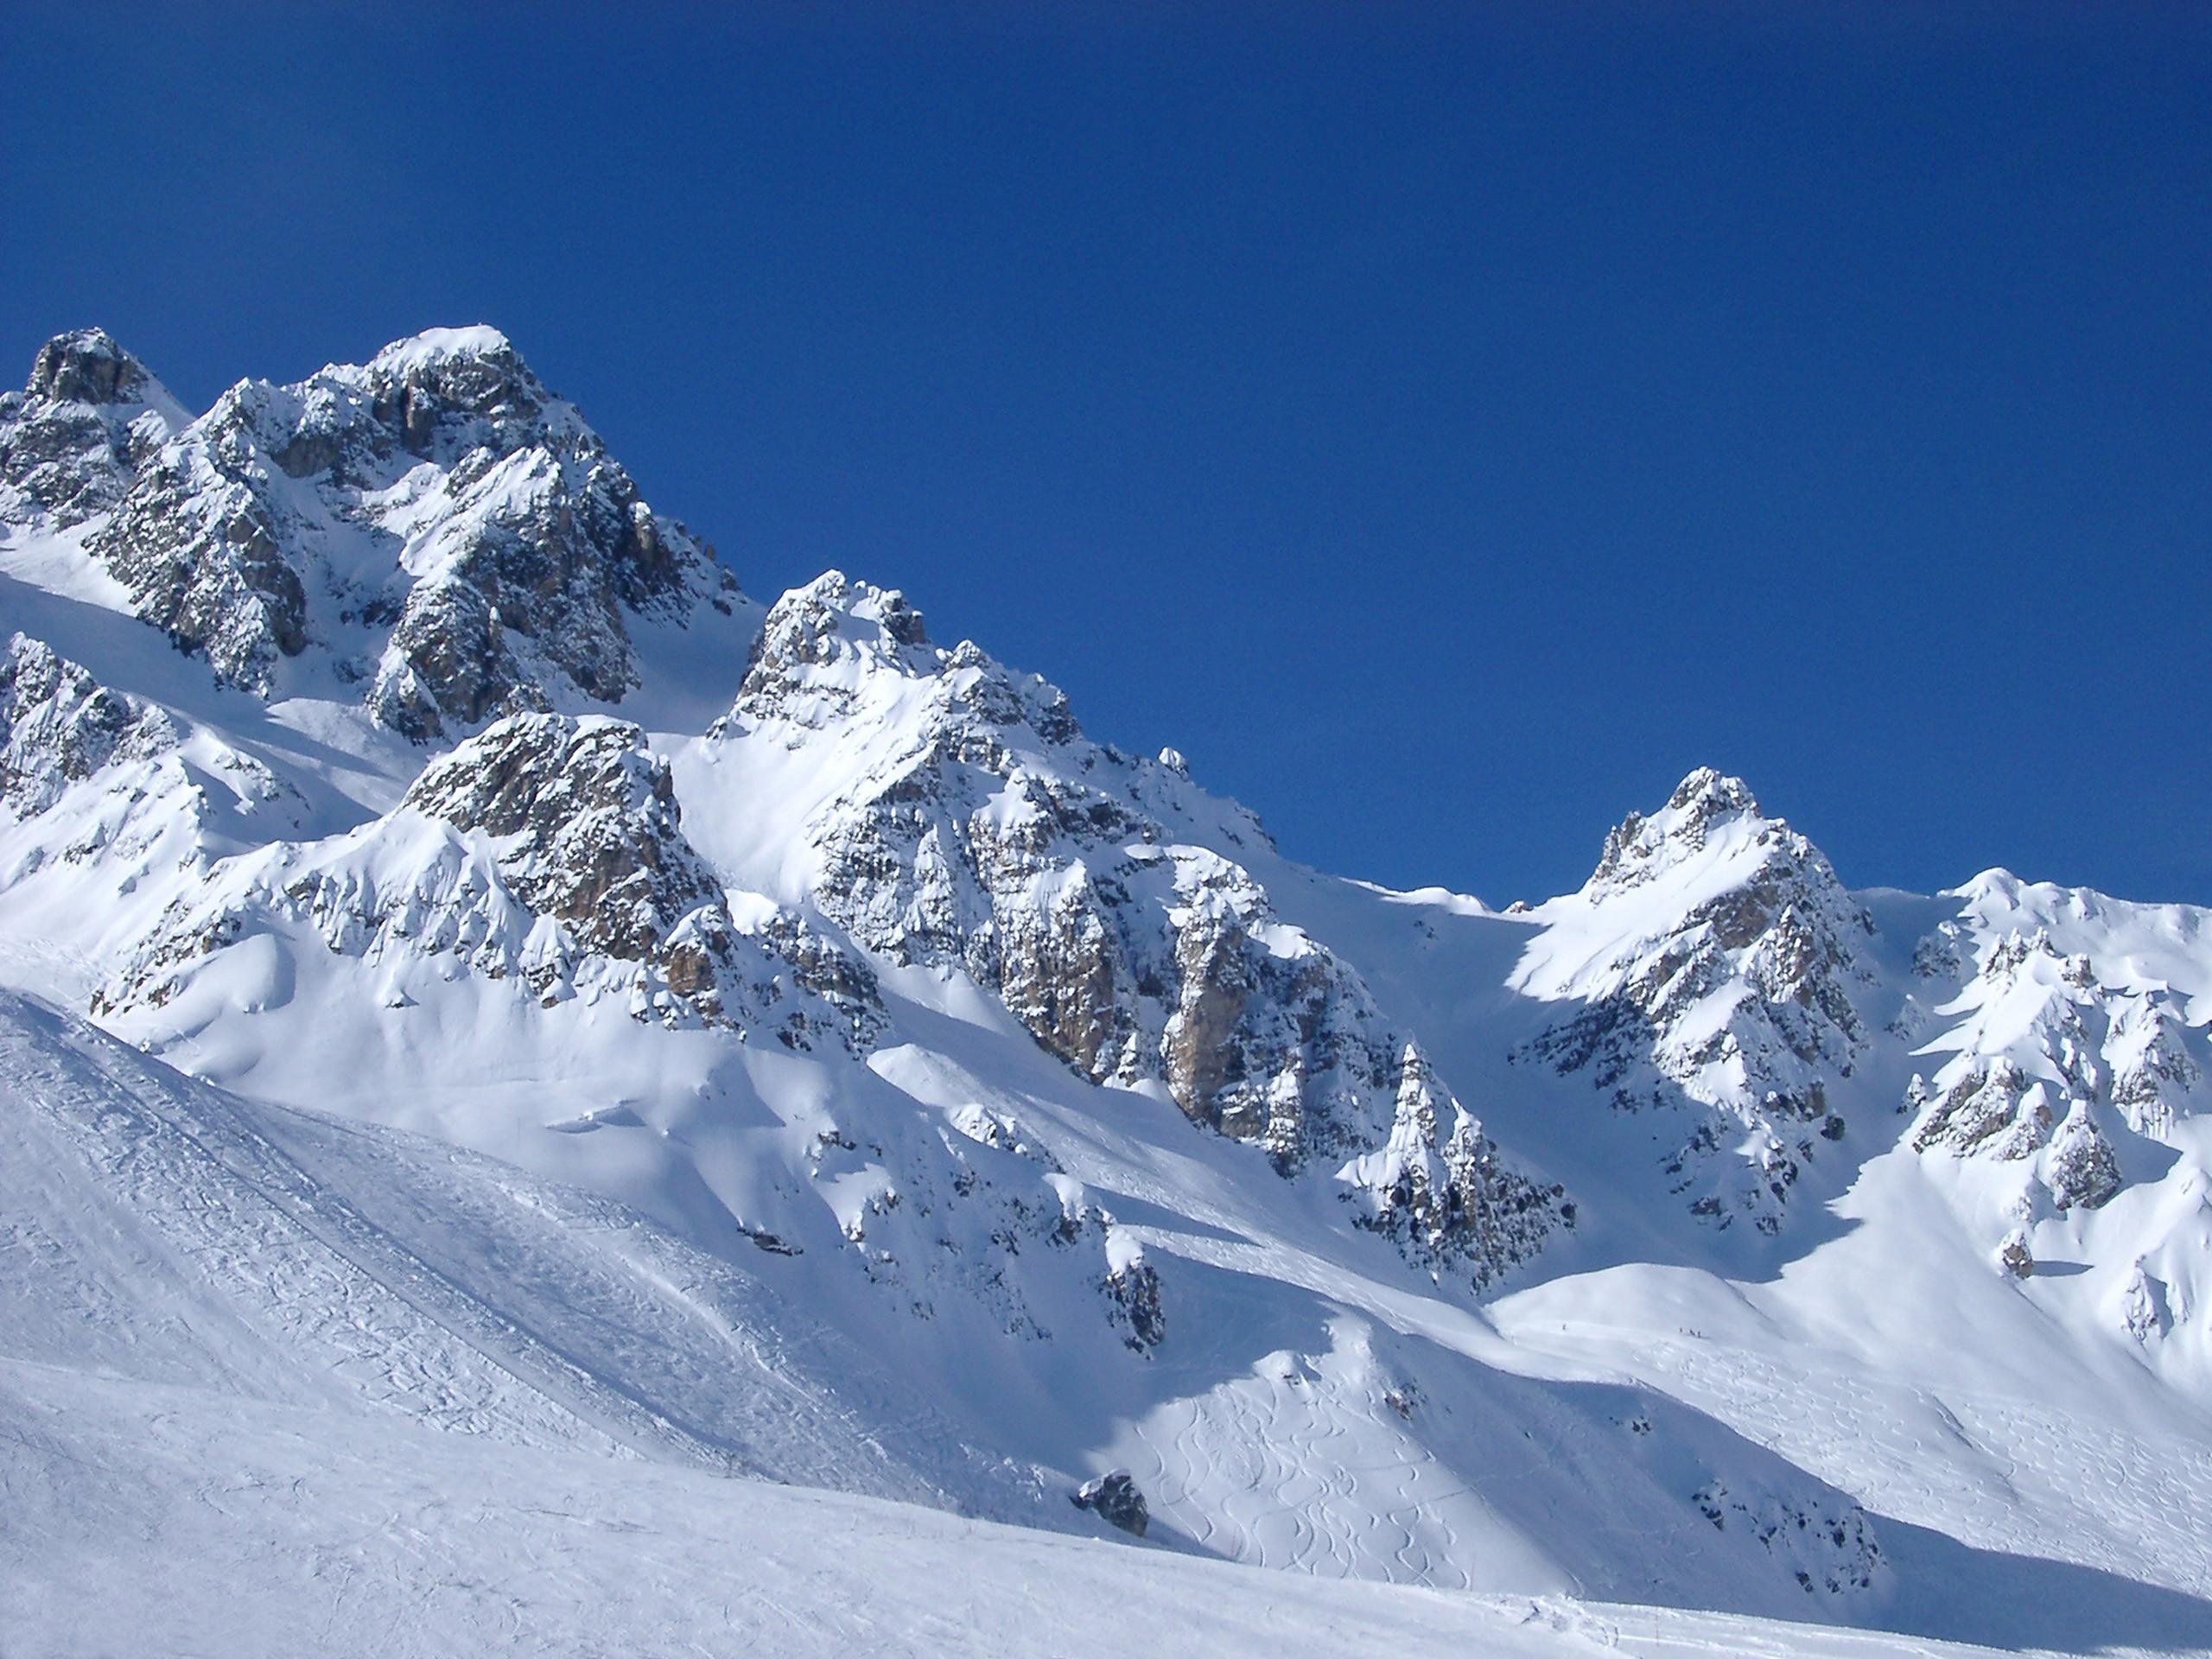 Winter And Snow Scenes